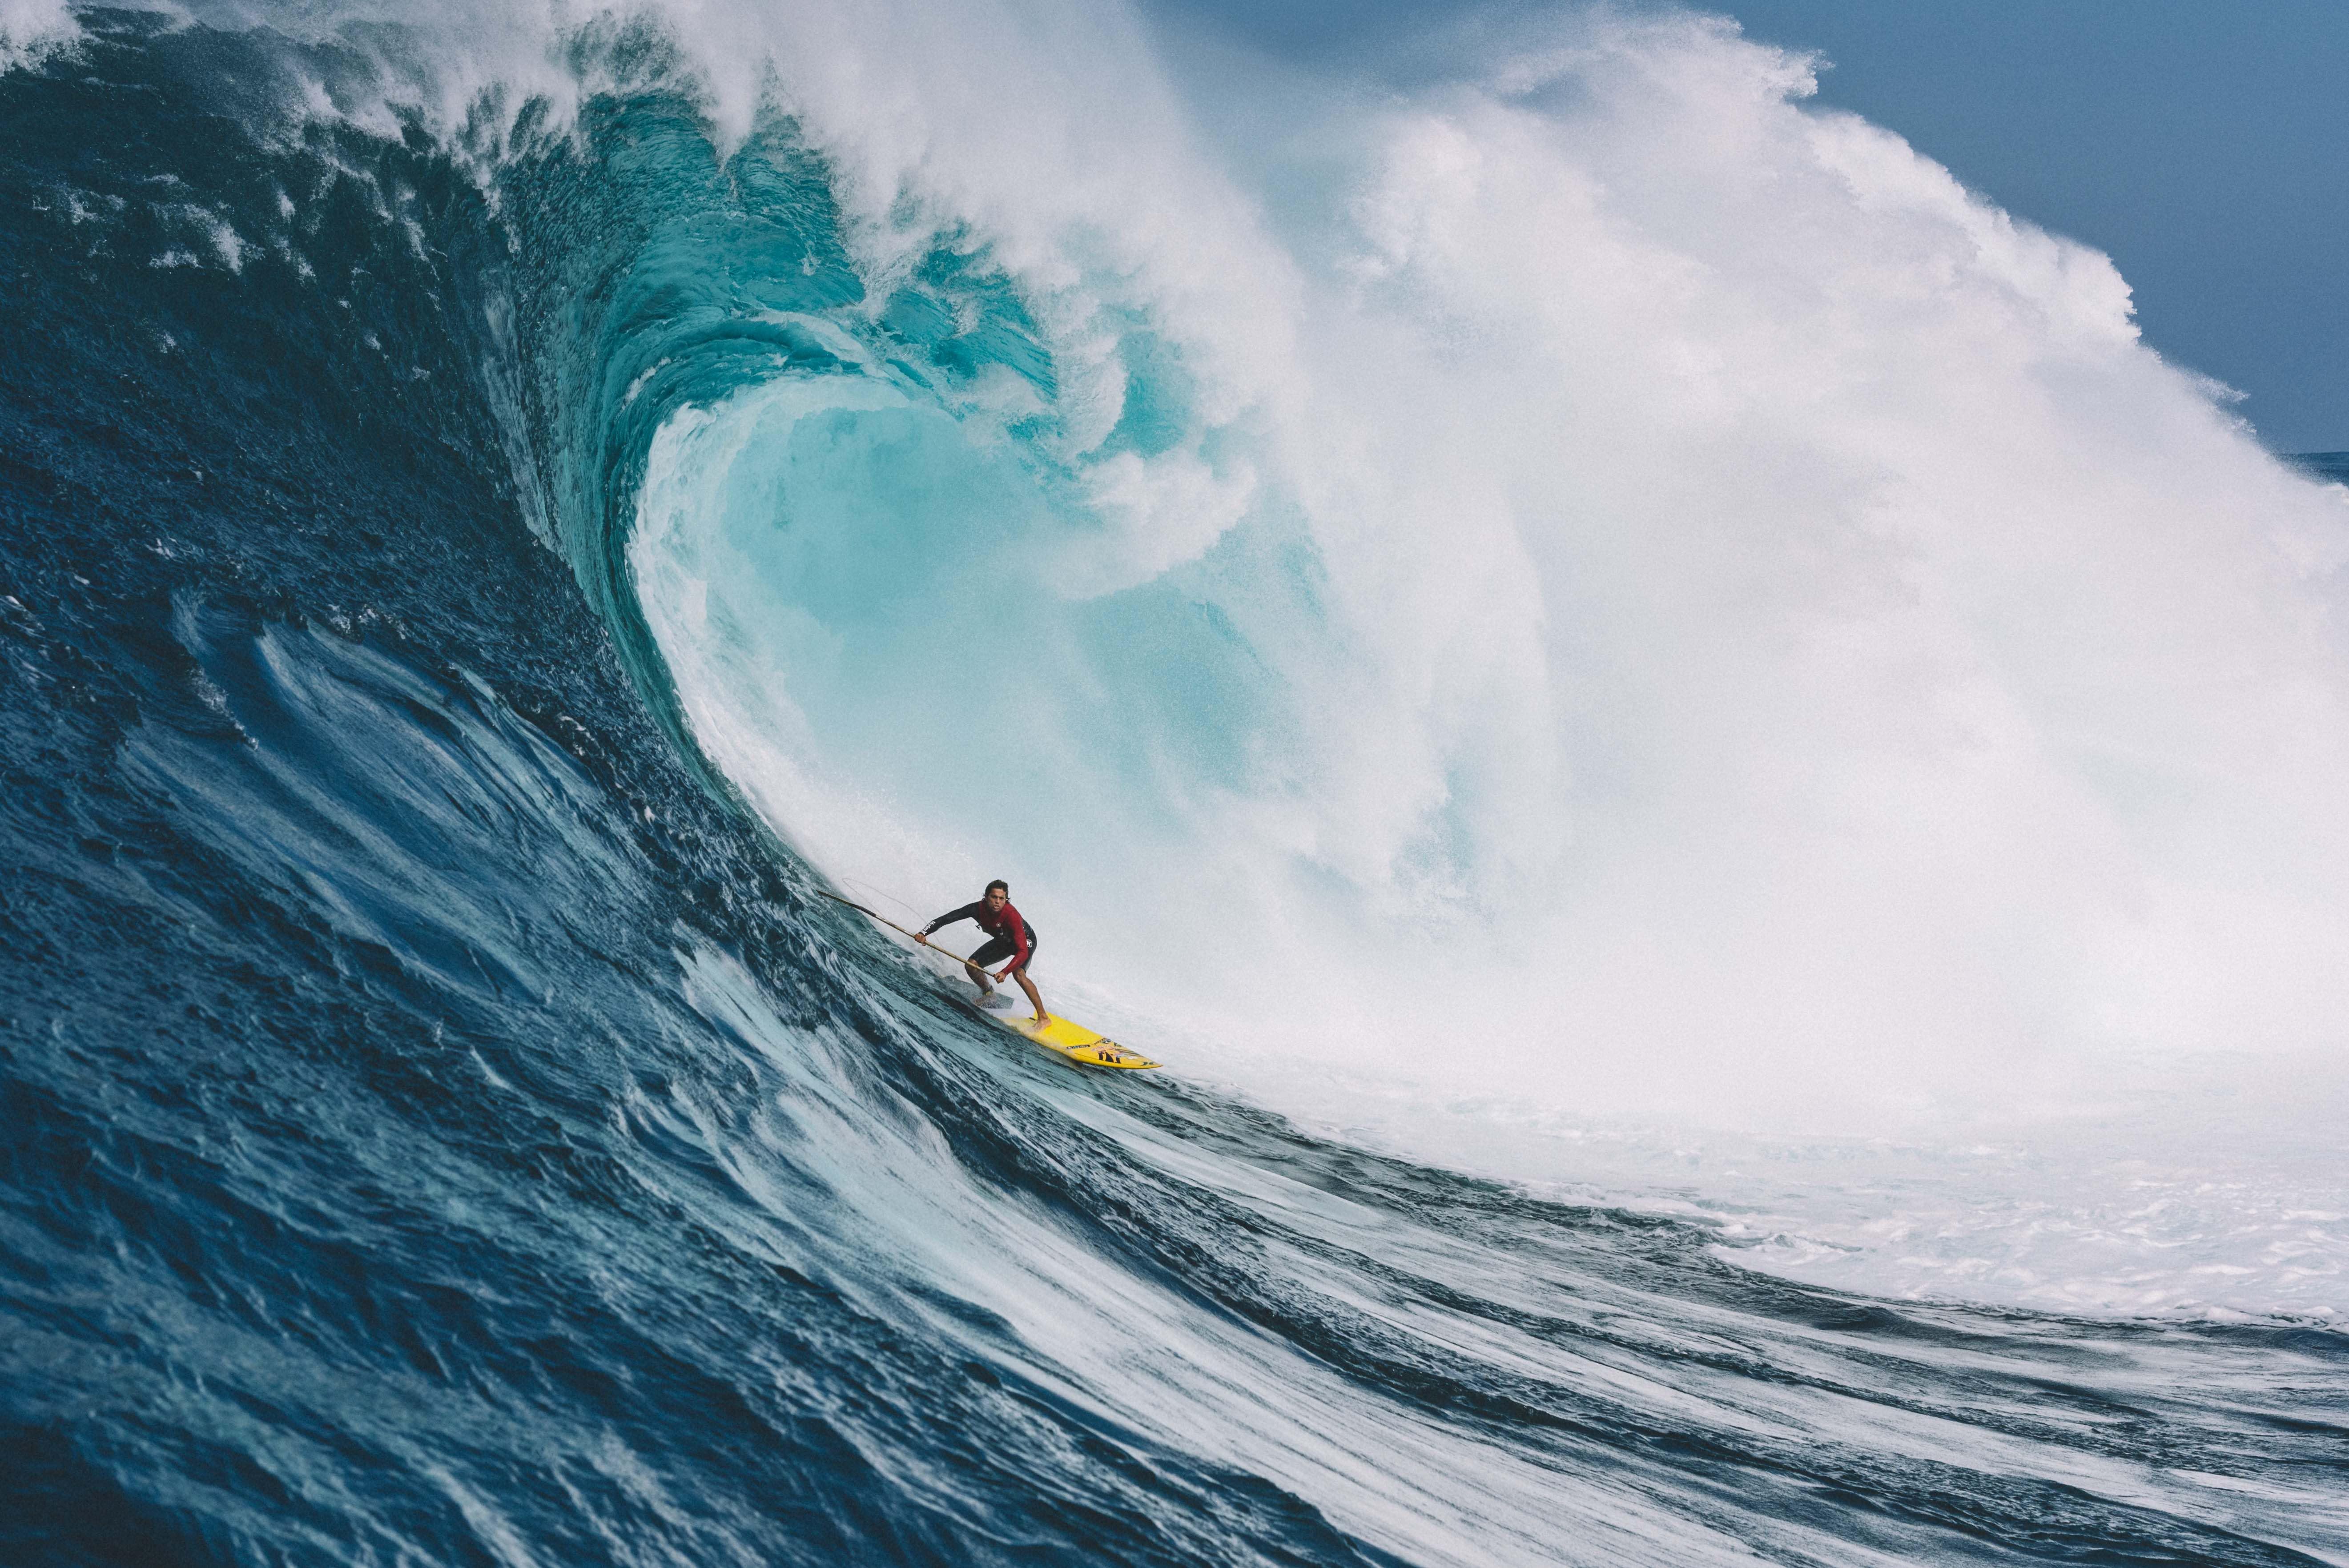 gaza surf club movie